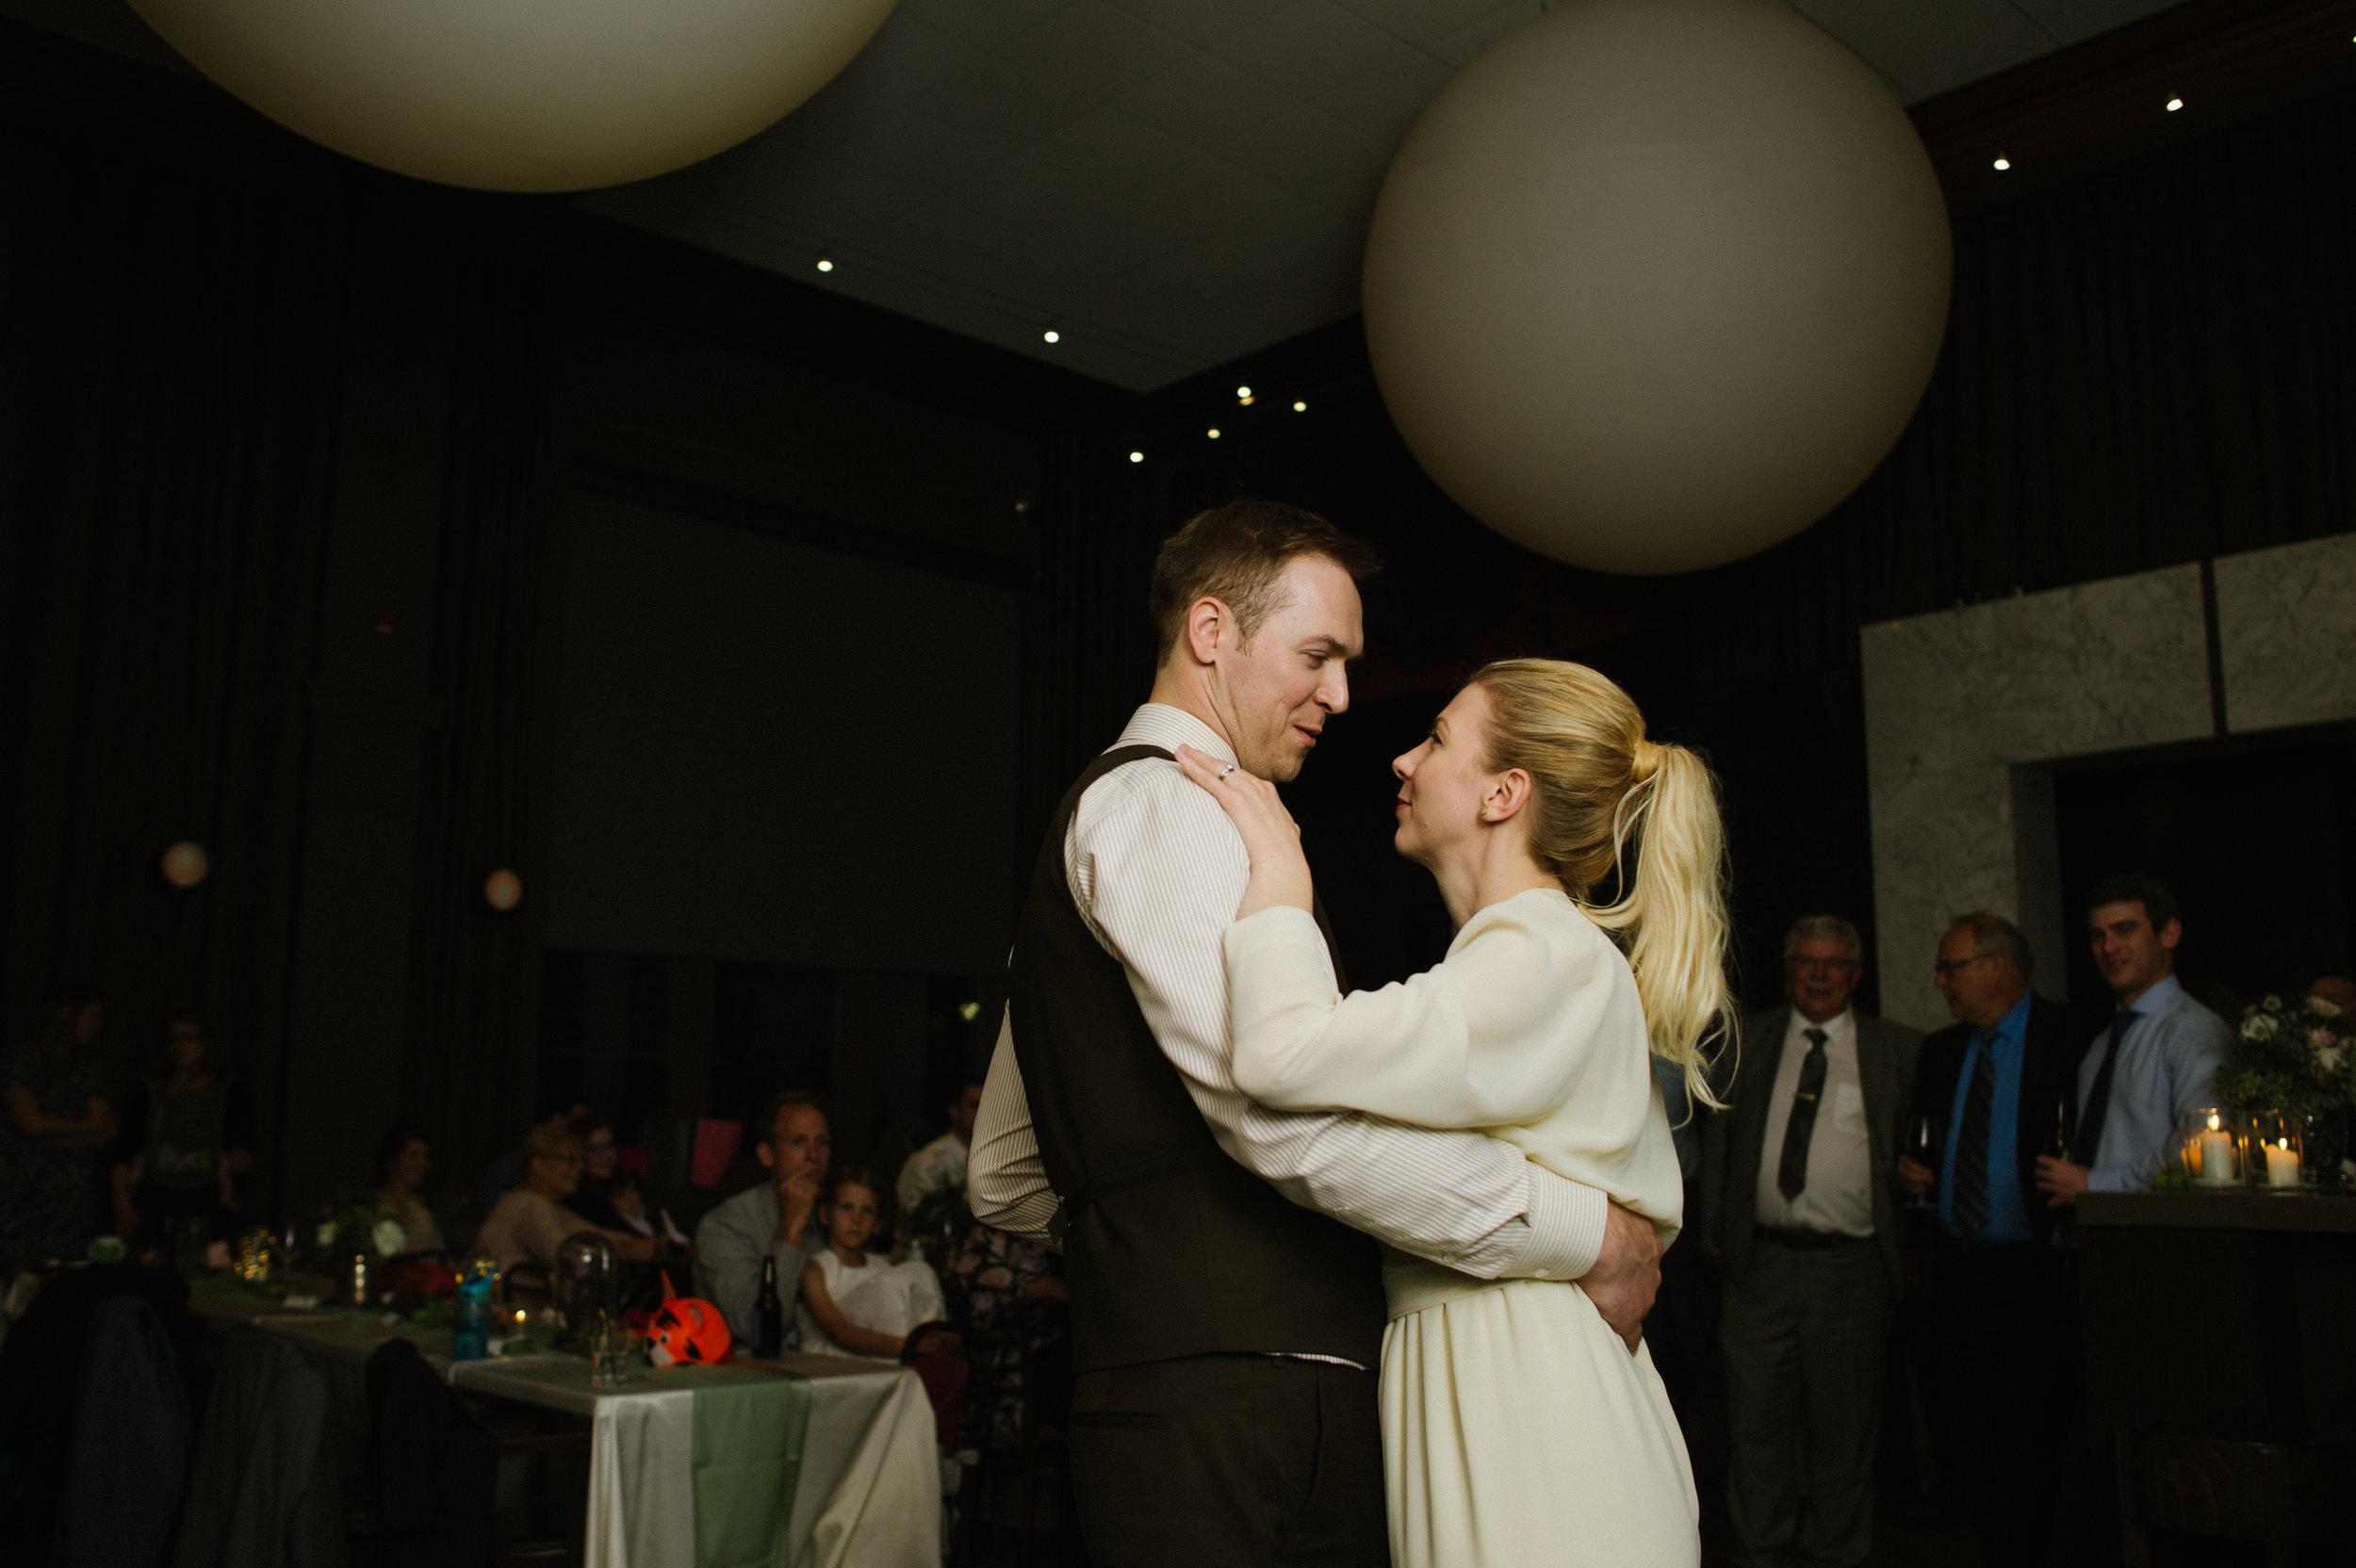 Teatro_Wedding_Calgary_Wedding_Photography_Vanessa_Tom_Married_2018_HR645.jpg